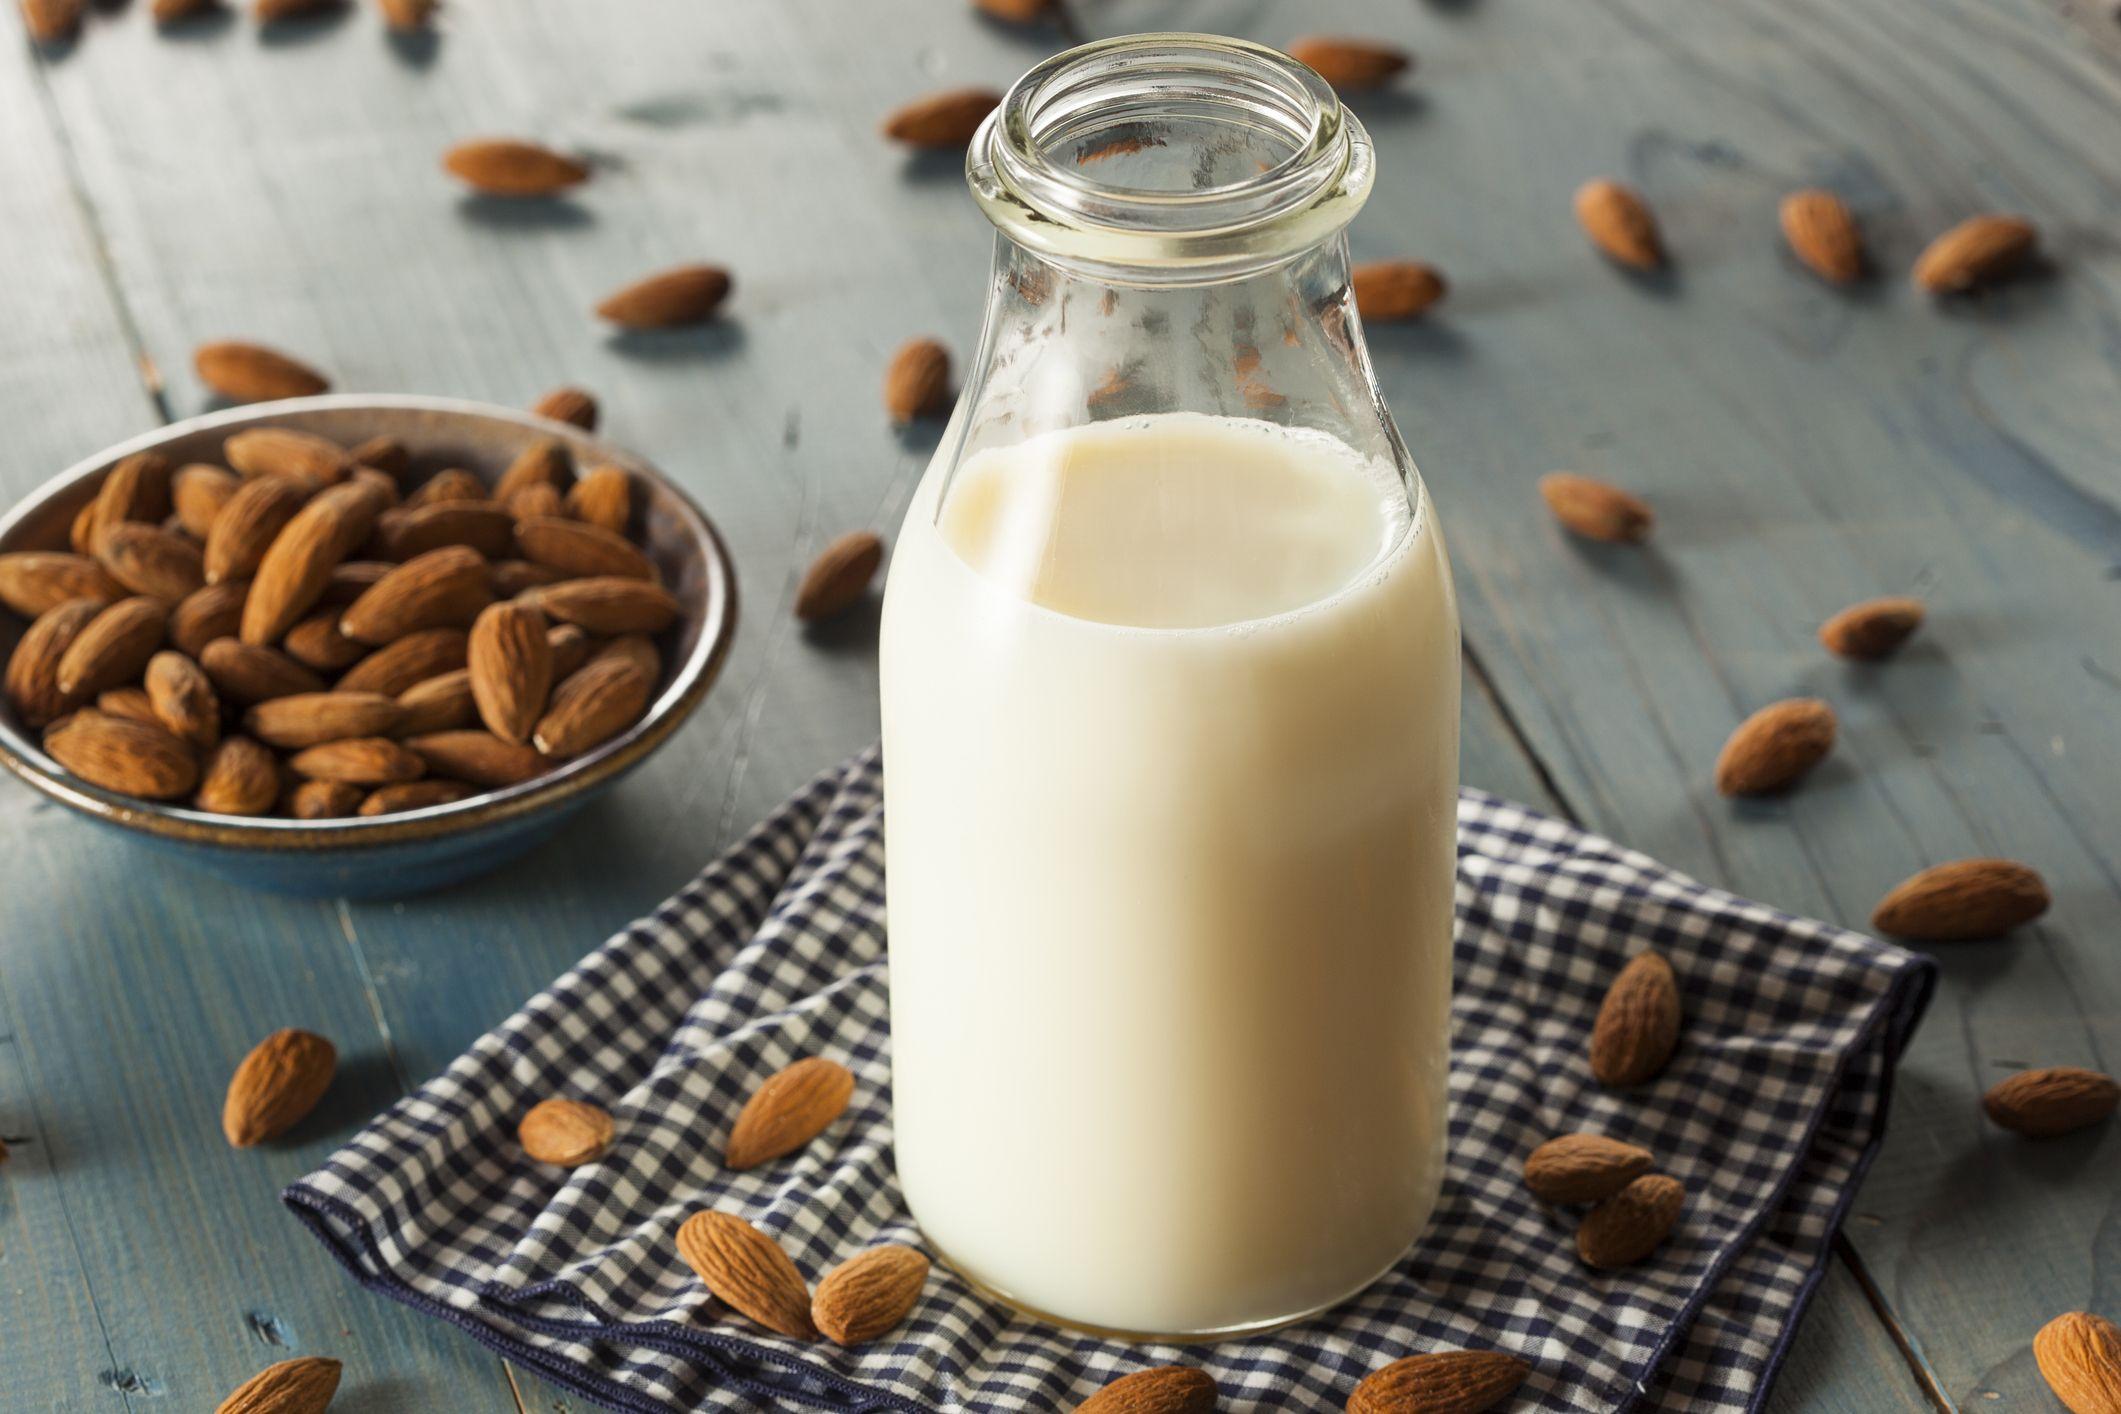 newsweek.com - Kashmira Gander - Why is the FDA cracking down on almond milk?